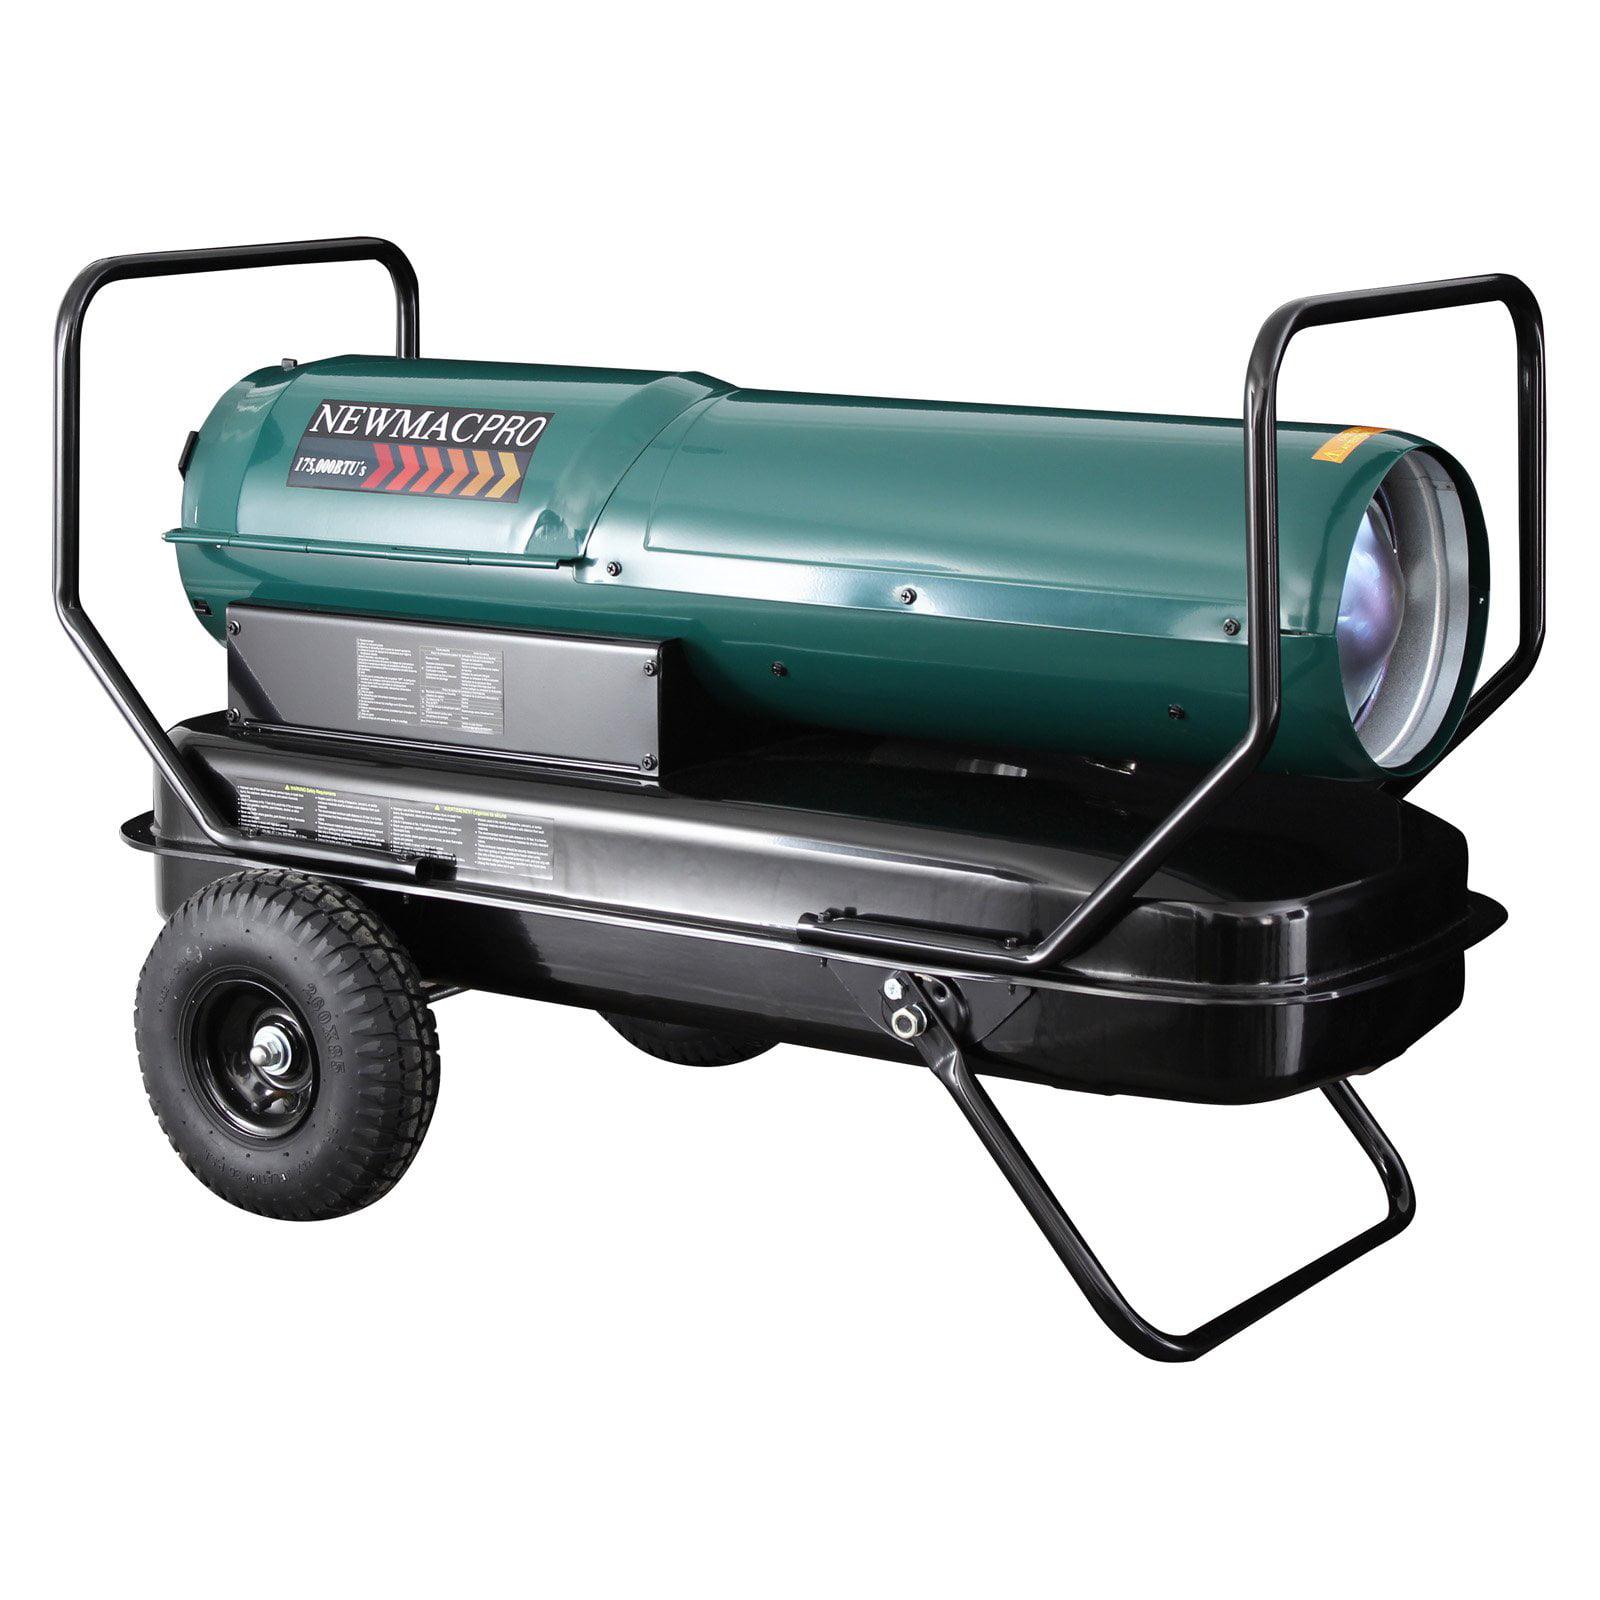 NewMac 175000 BTU Forced Air Kerosene Heater by